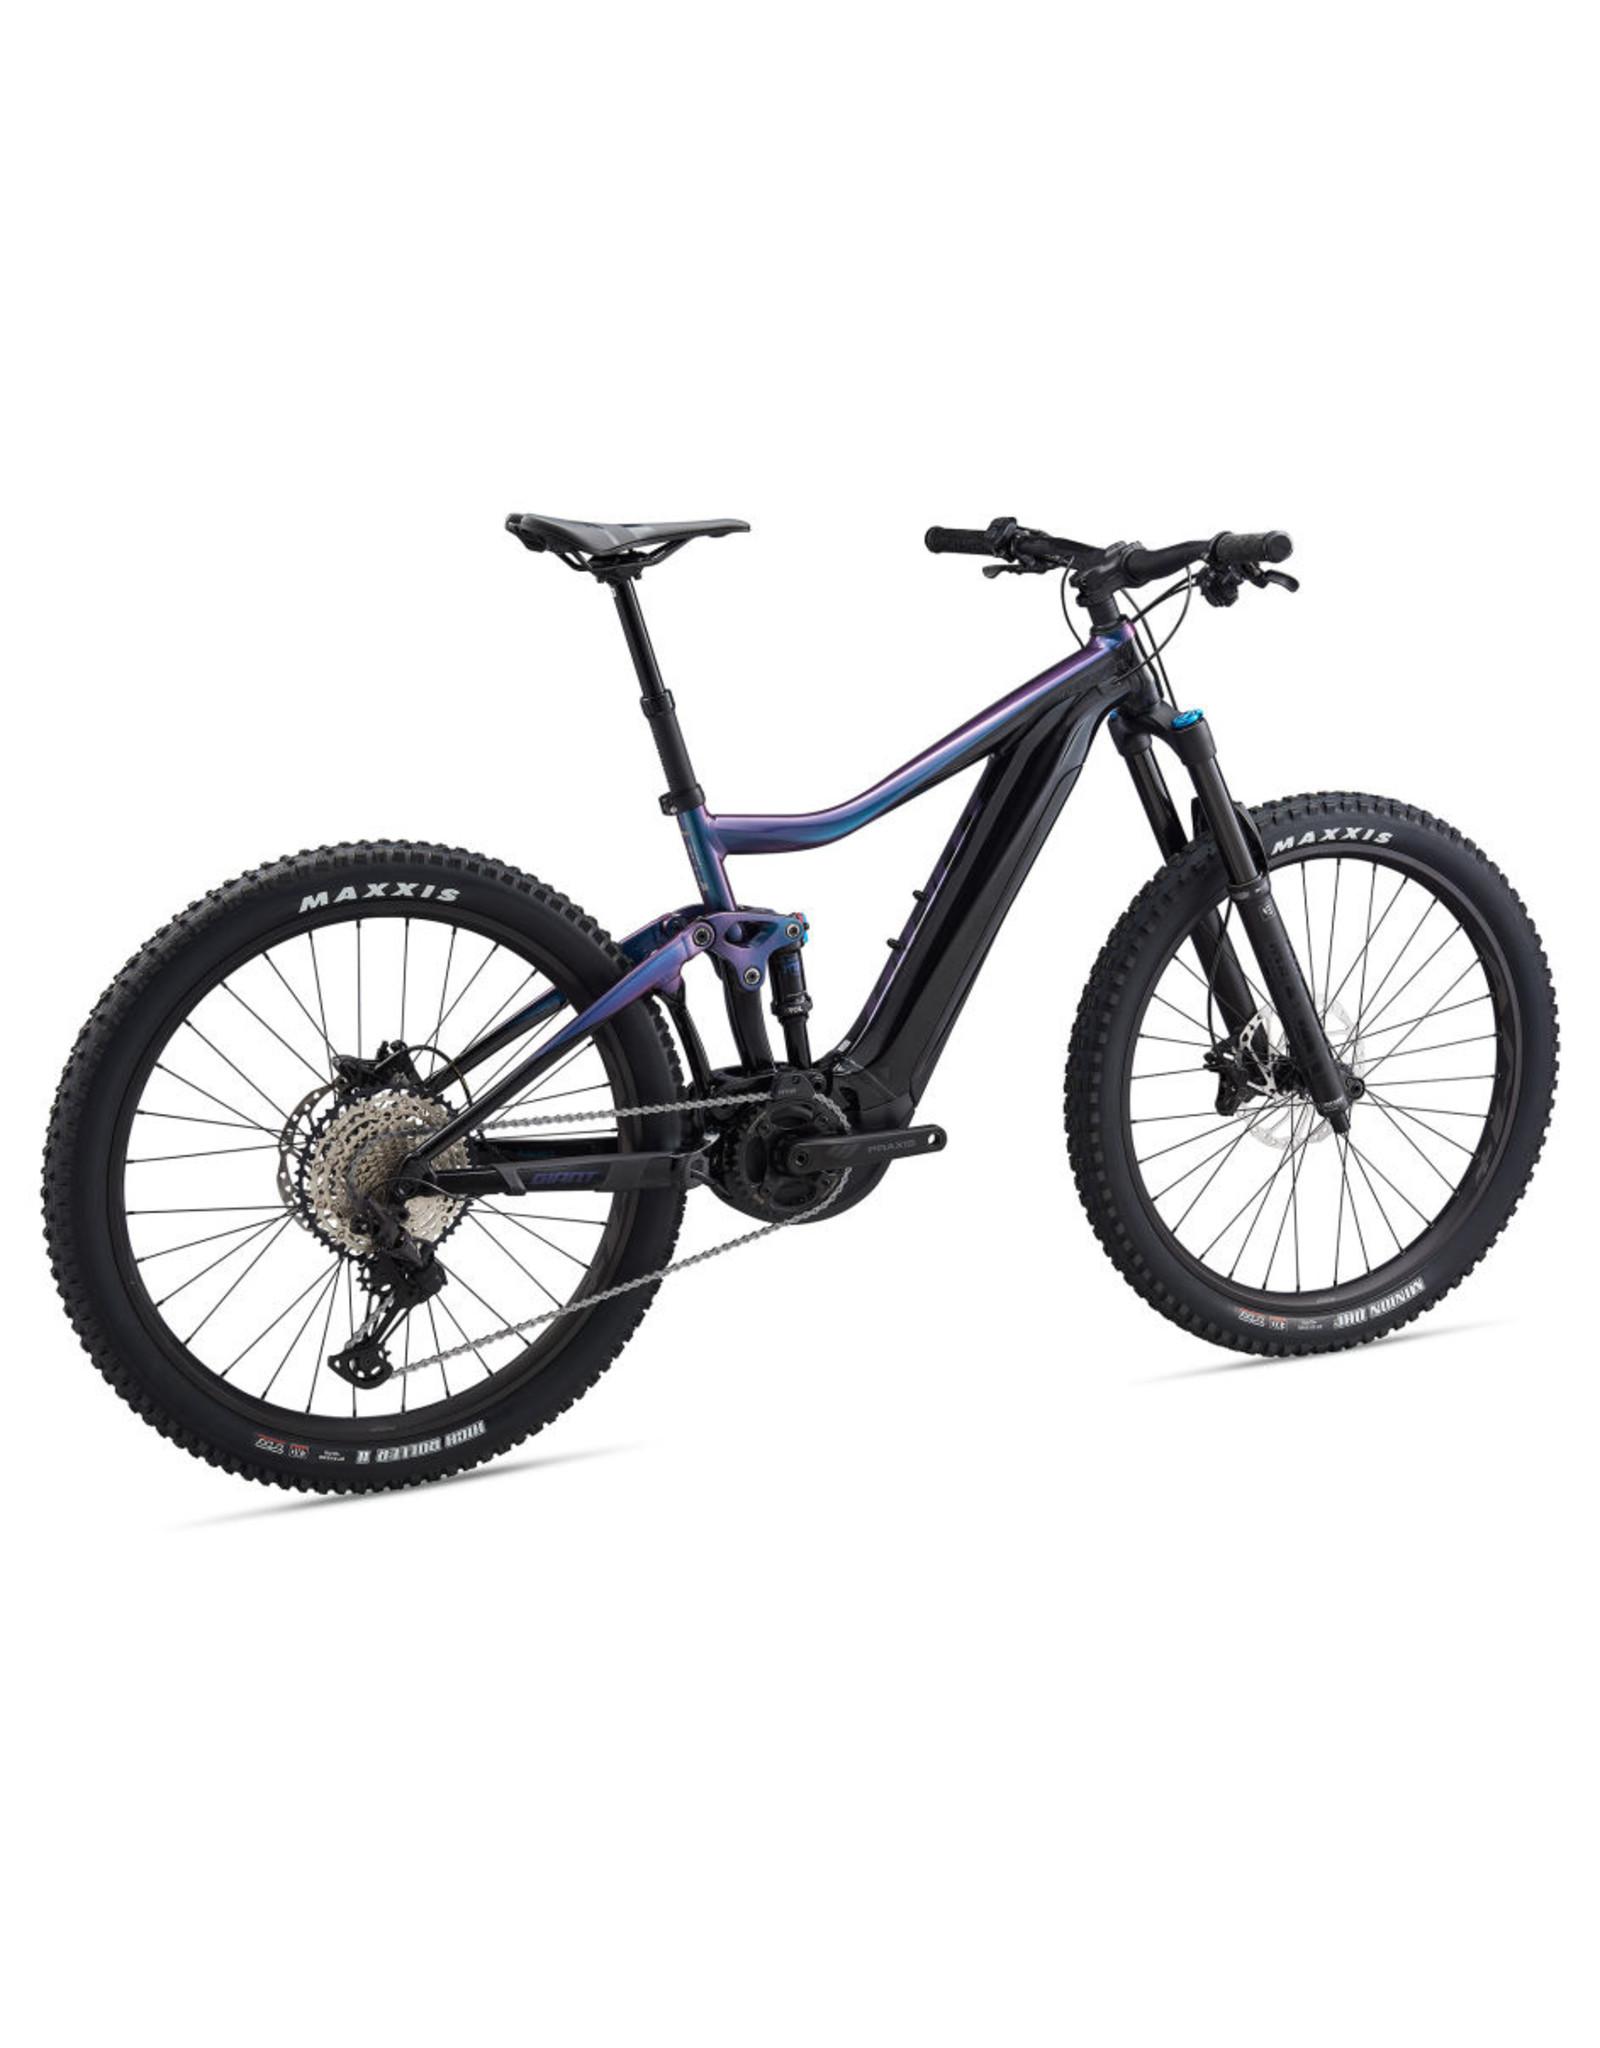 GIANT BICYCLES 2020 Trance E+ 2 Pro